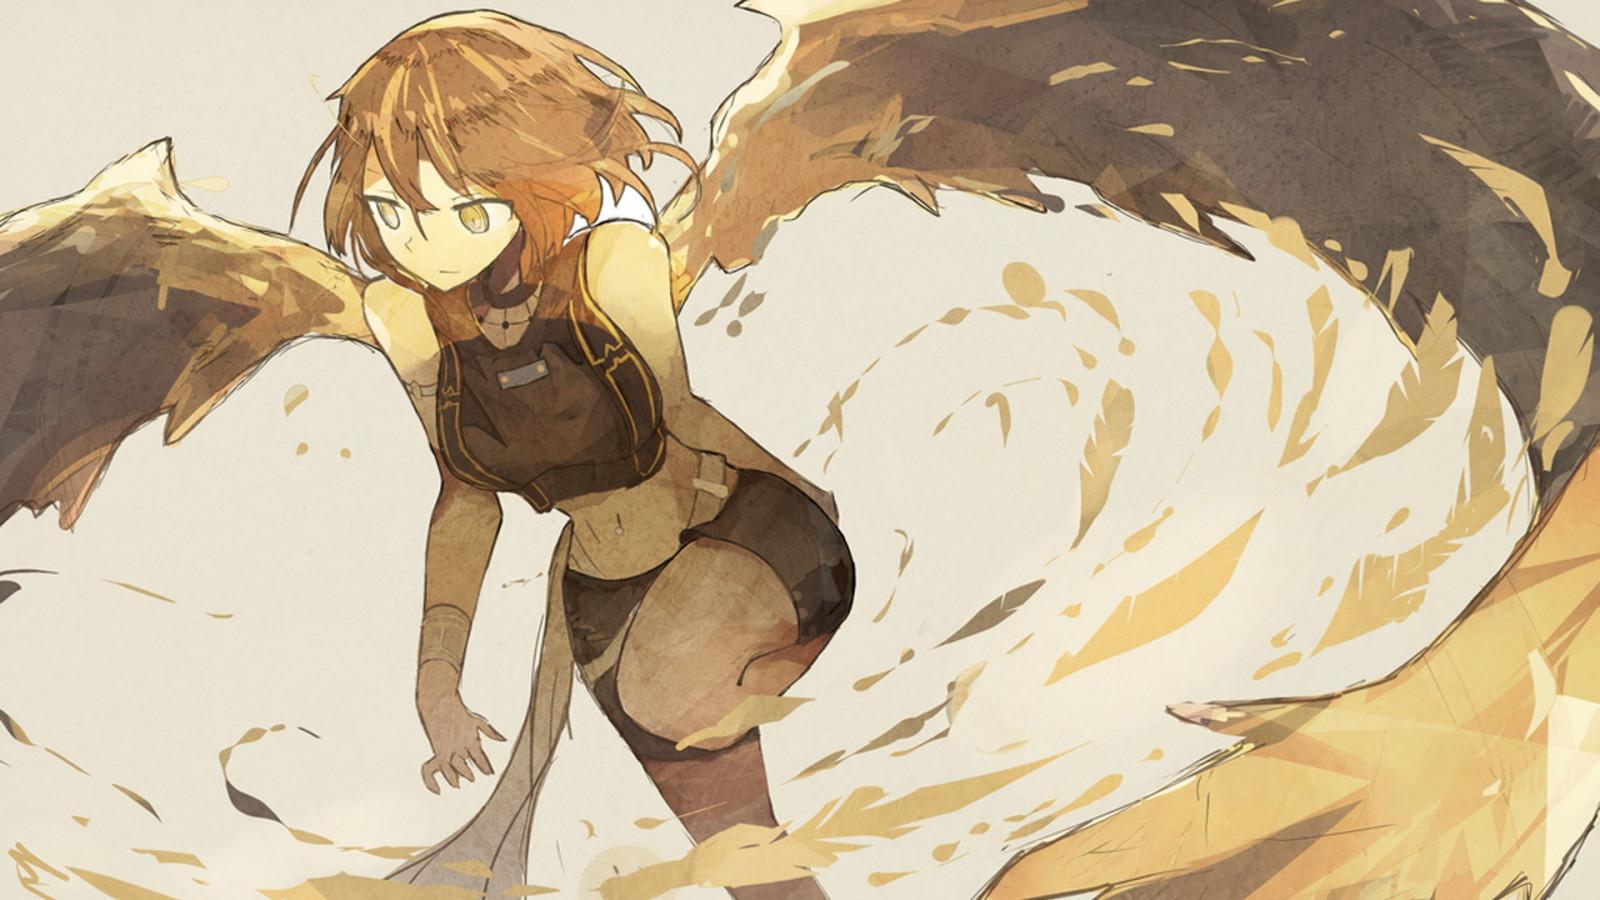 New Cute Girl Wallpaper Download Wallpaper Drawing Illustration Anime Girls Wings